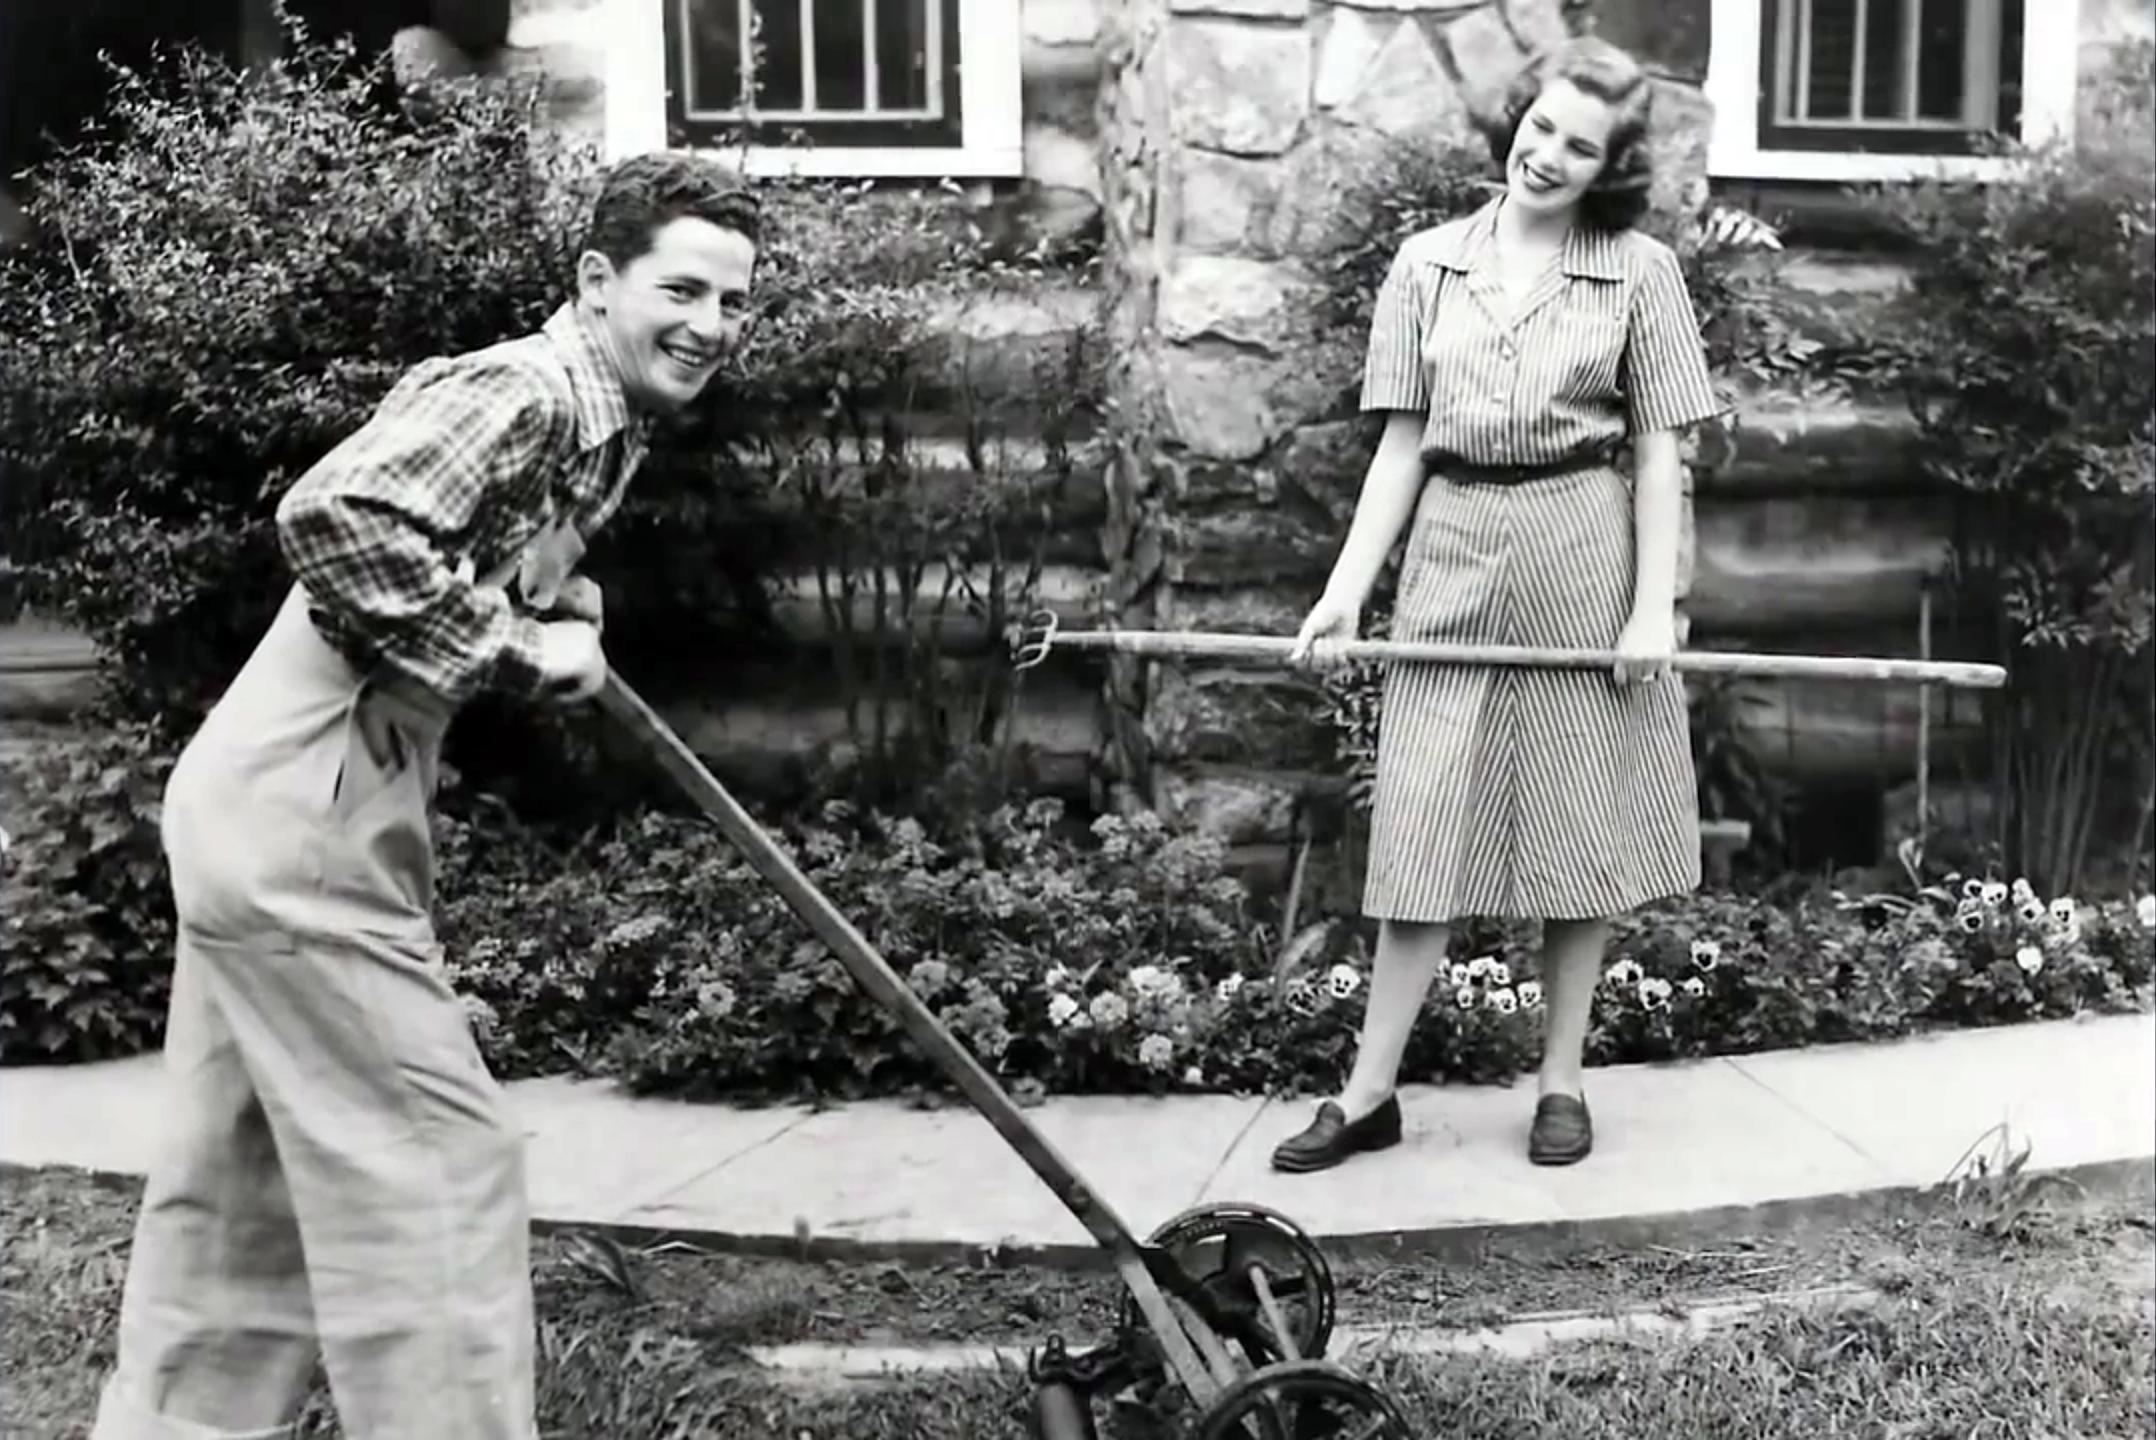 The Johnson Family Singers & Betty Johnson